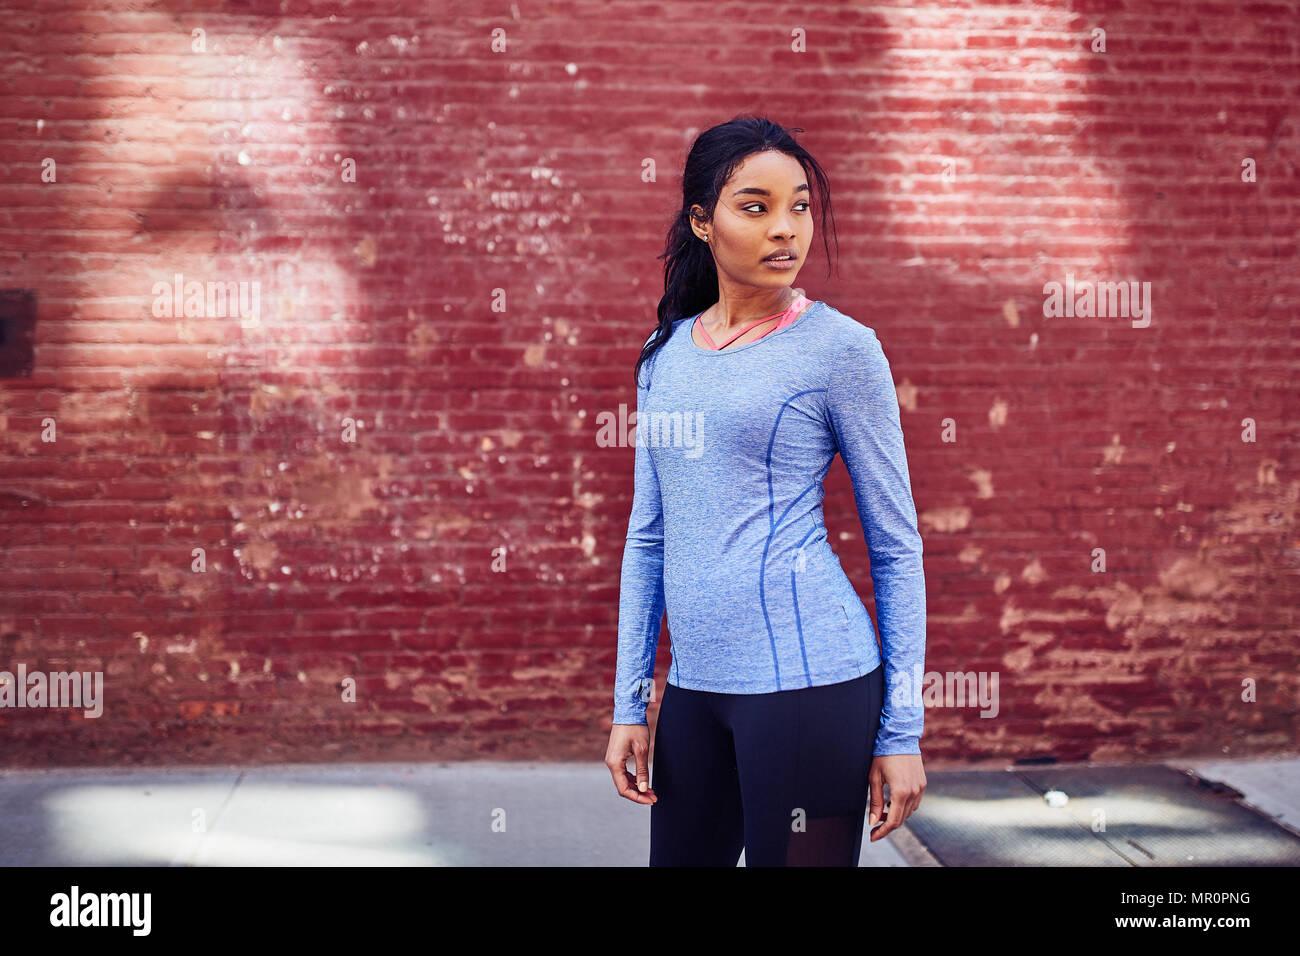 Schwarze Frau ruht nach dem Ausführen Stockbild